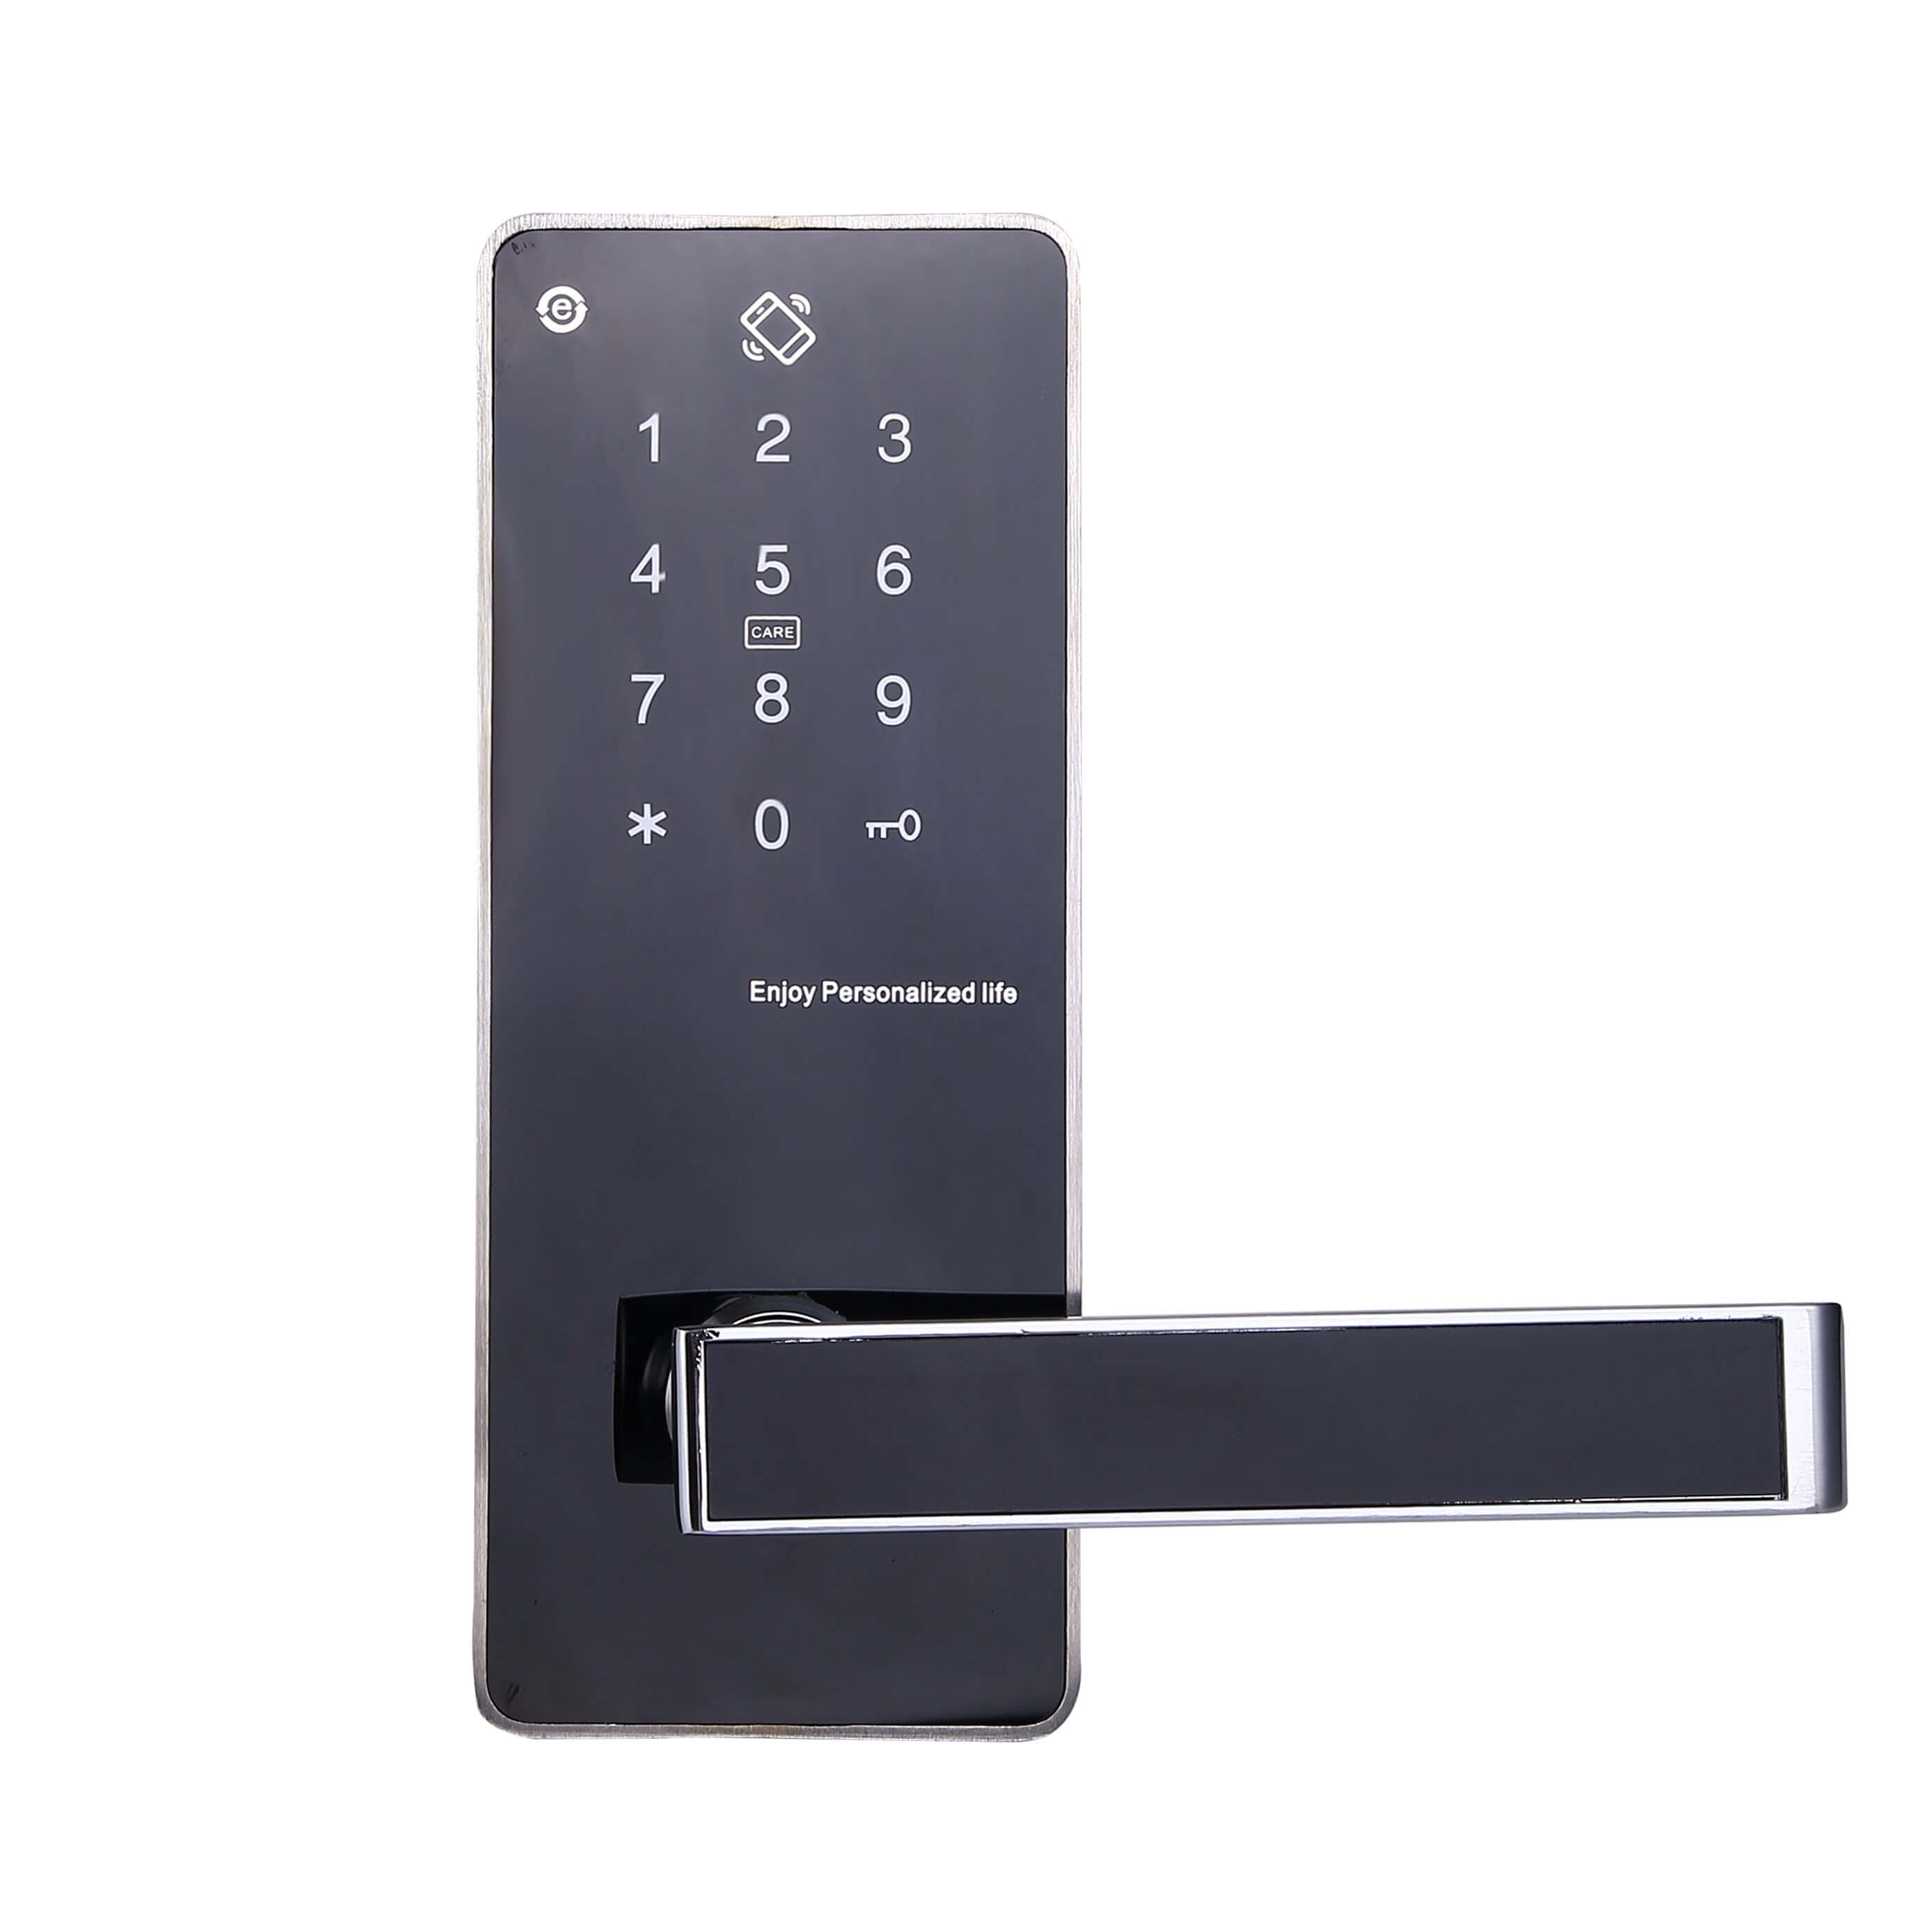 Smart RFID Mifare Door Lock with Pin Code and Mechanical Keys SL P8822 3 - Smart RFID Mifare Door Lock with Pin Code and Mechanical Keys SL-P8822